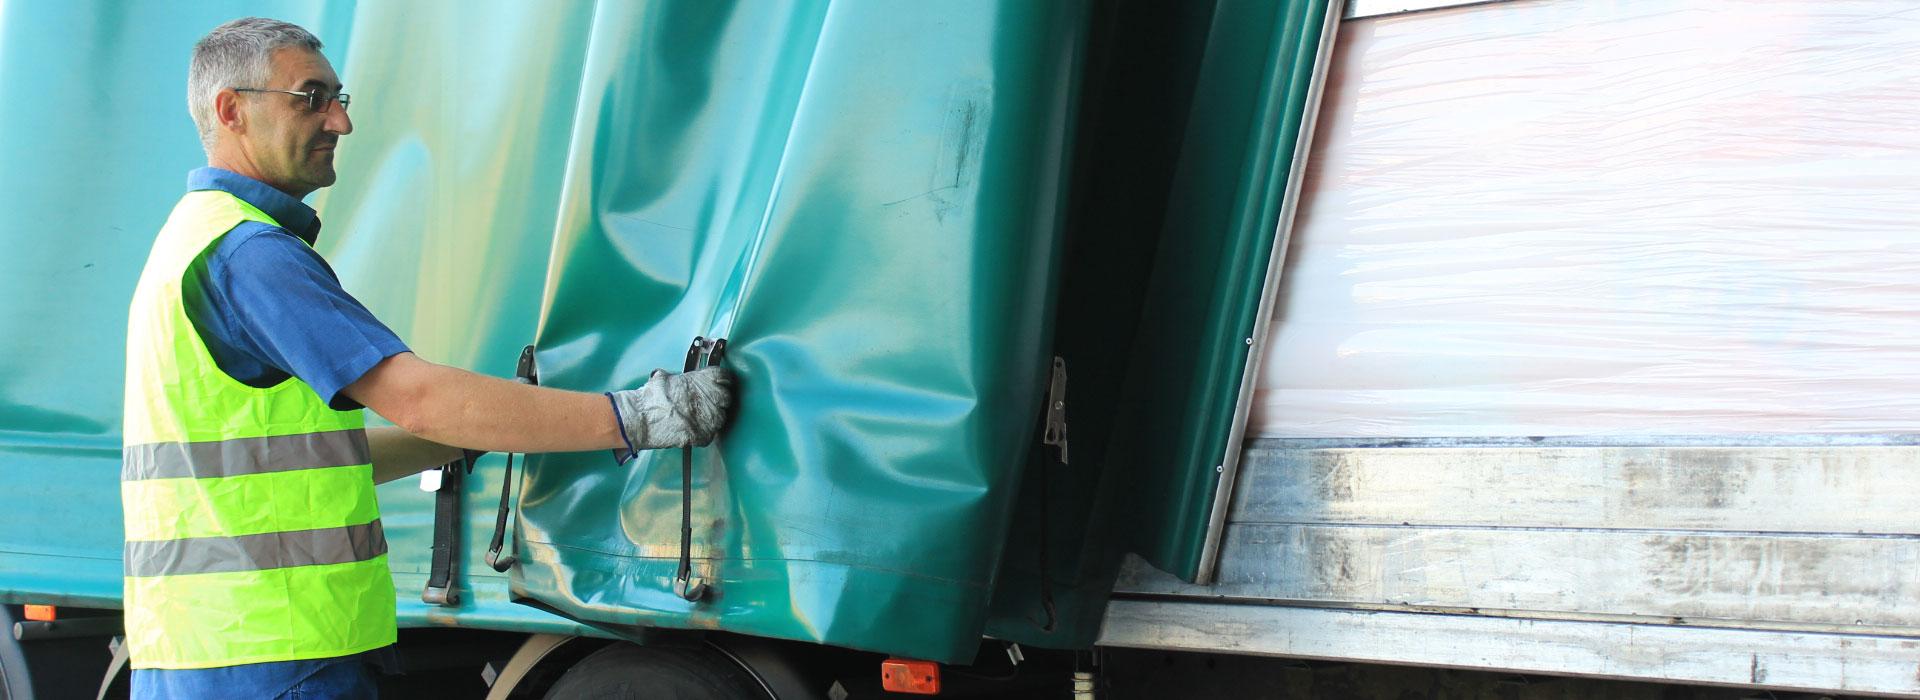 Camioner estirant toldo - Seberlogistics